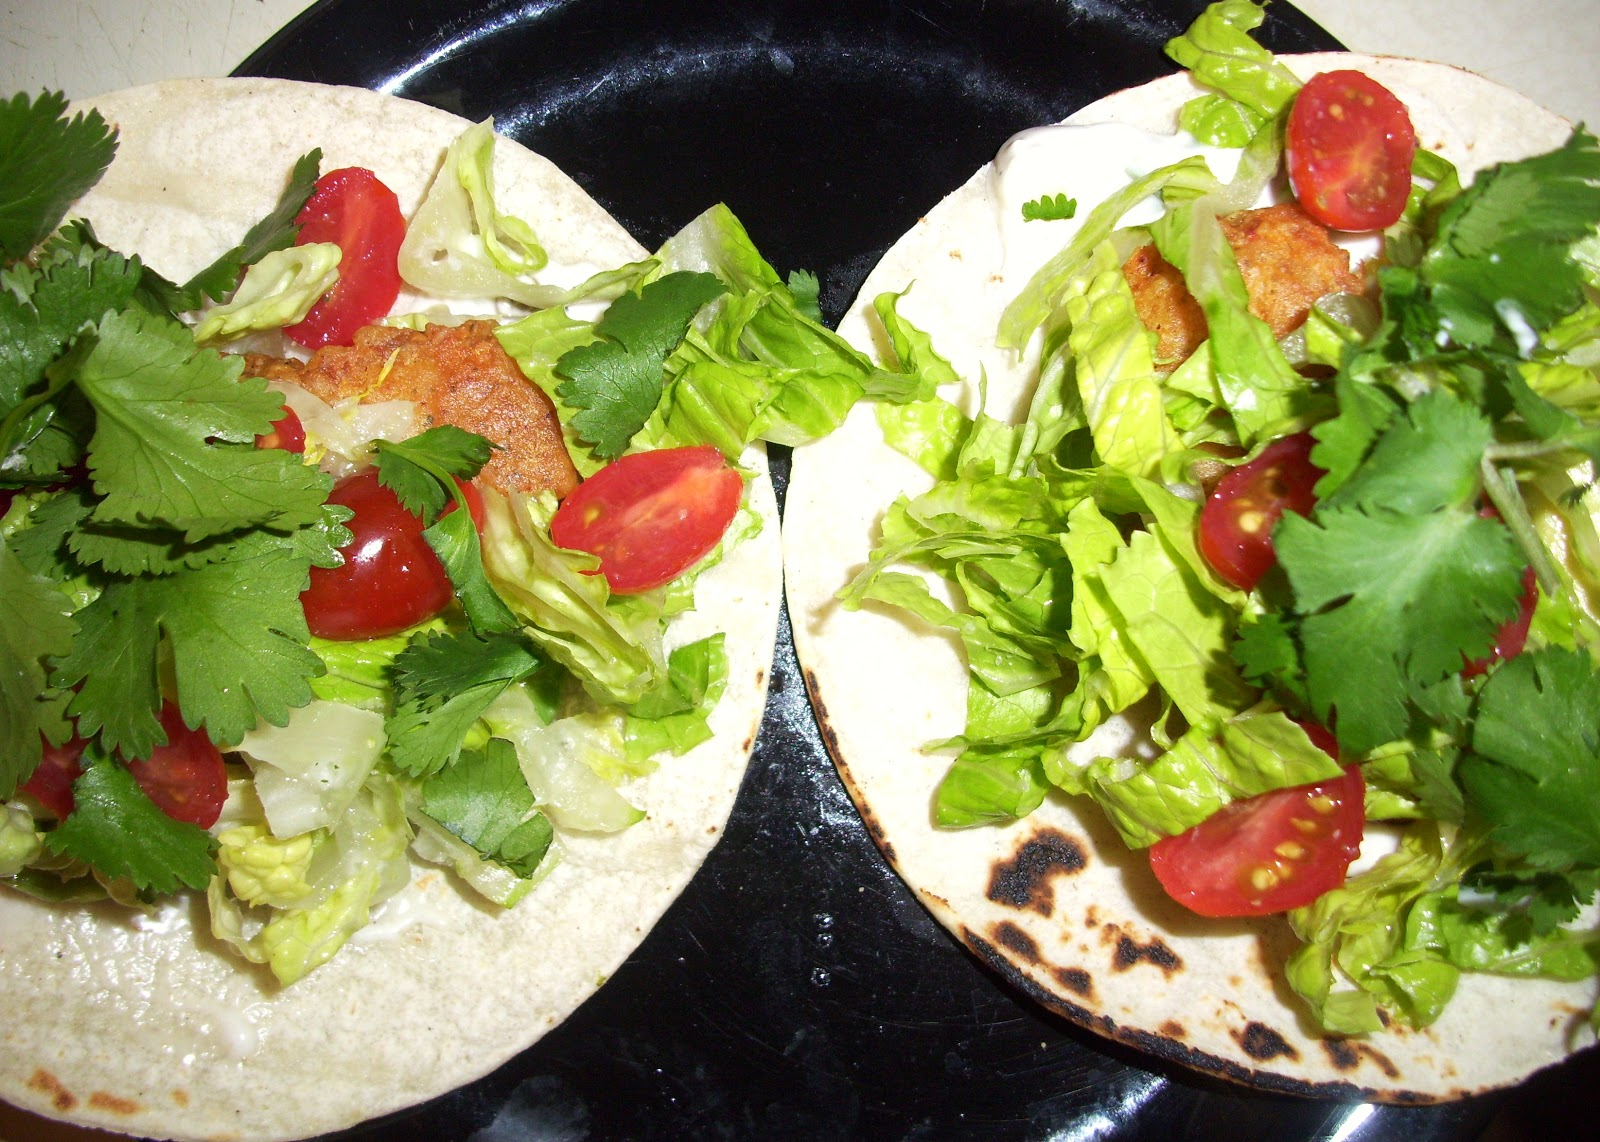 The gastric bypass vegan baja style vegan fish tacos for Vegan fish tacos